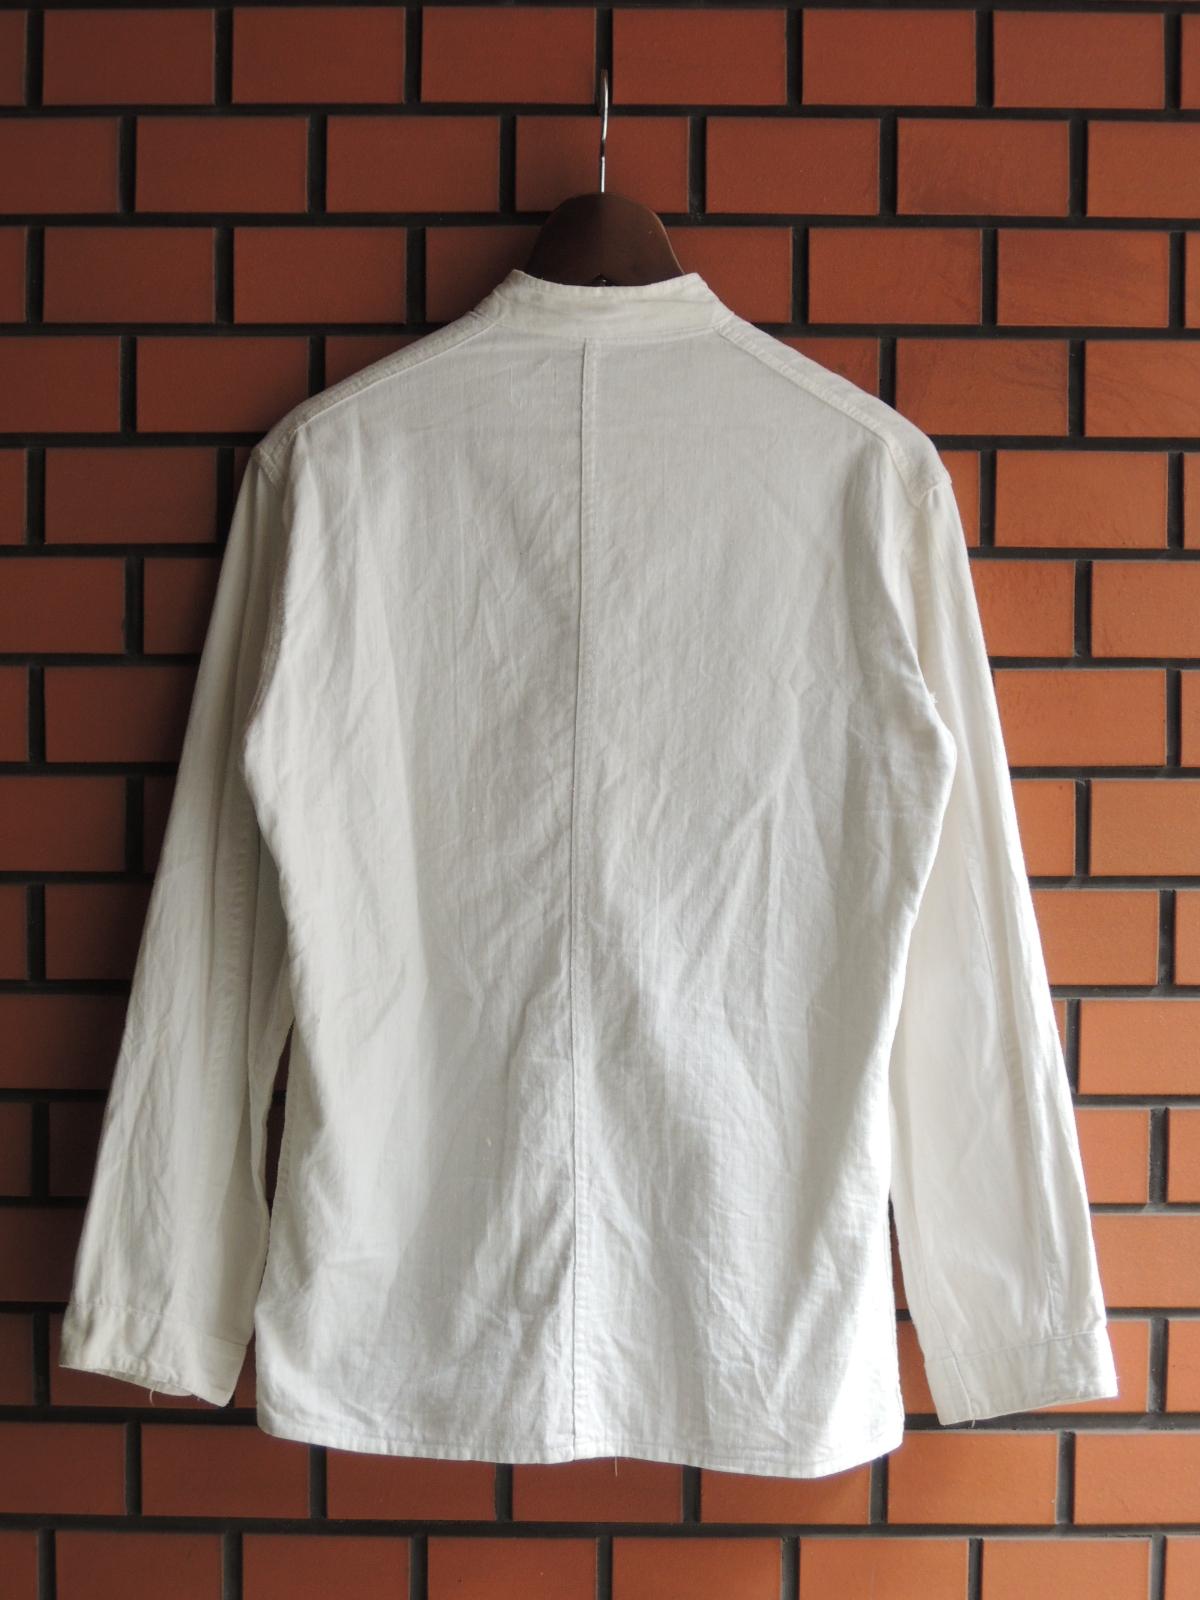 7upcottonjacket03.JPG